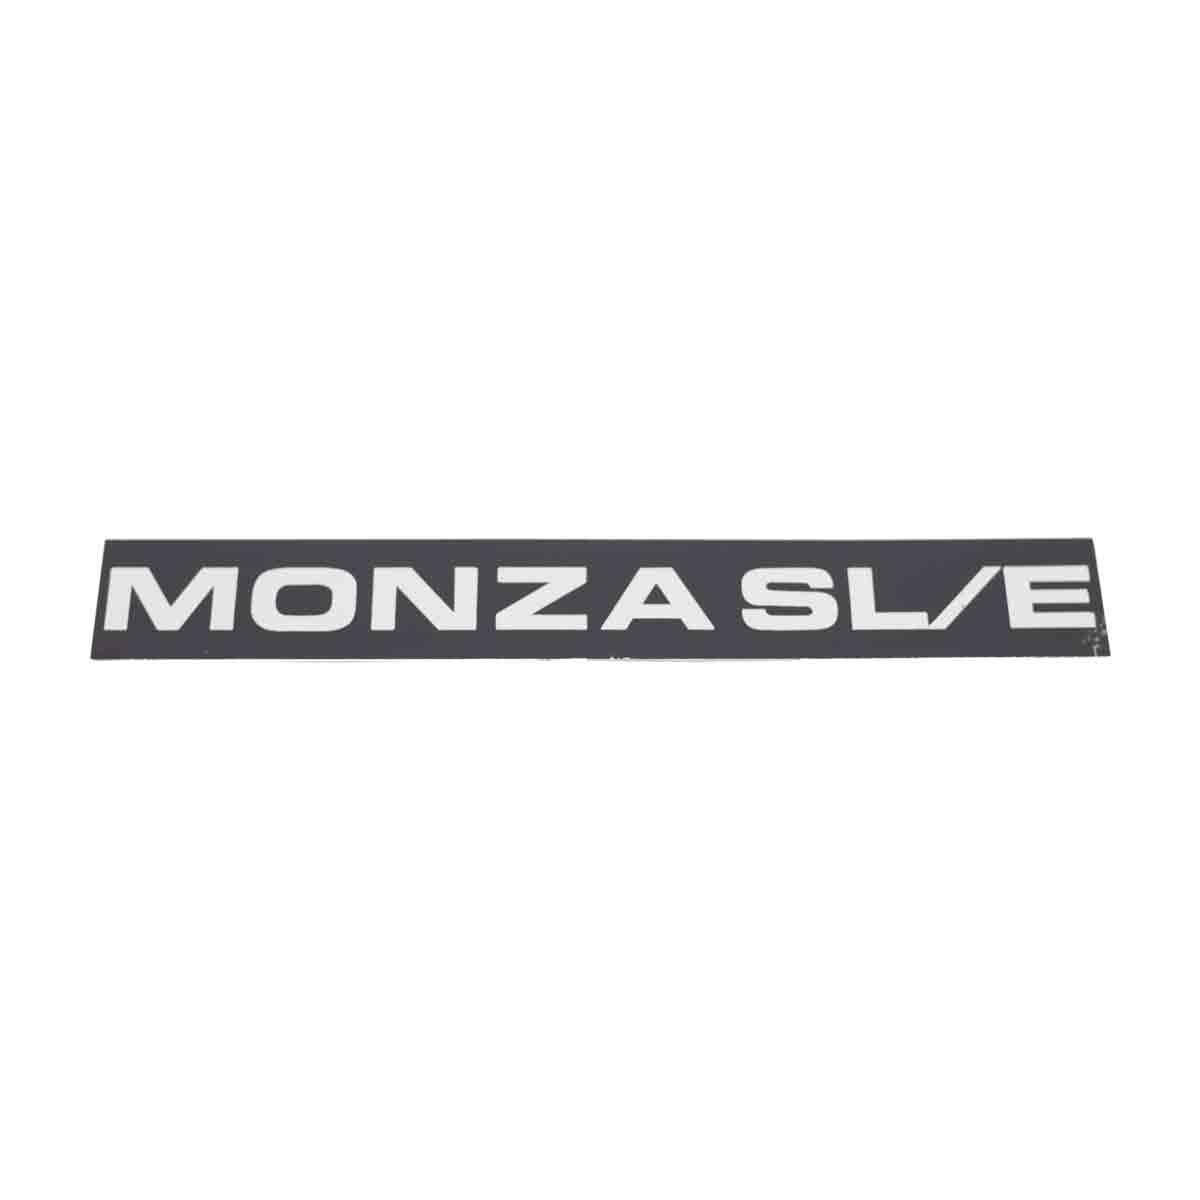 Plaqueta Friso Lateral Monza SL/E 87/89 Larga